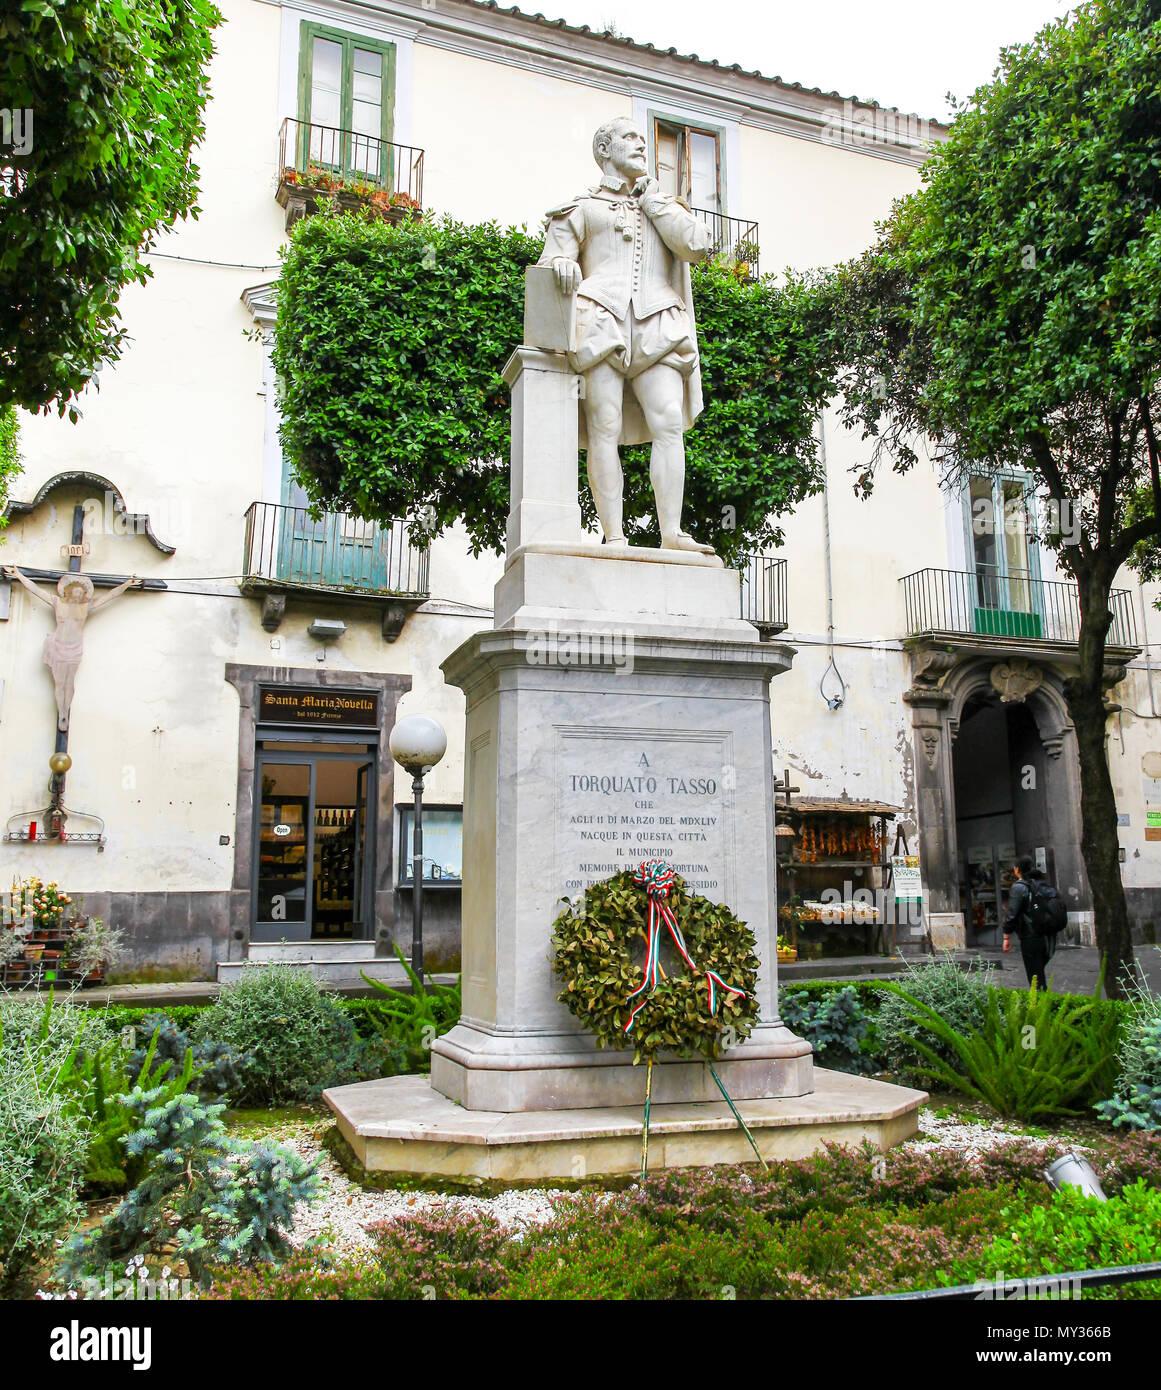 A statue of Torquato Tasso, an Italian poet of the 16th century, born in Sorrento in 1544, in Piazza Tasso, Sorrento, Italy - Stock Image